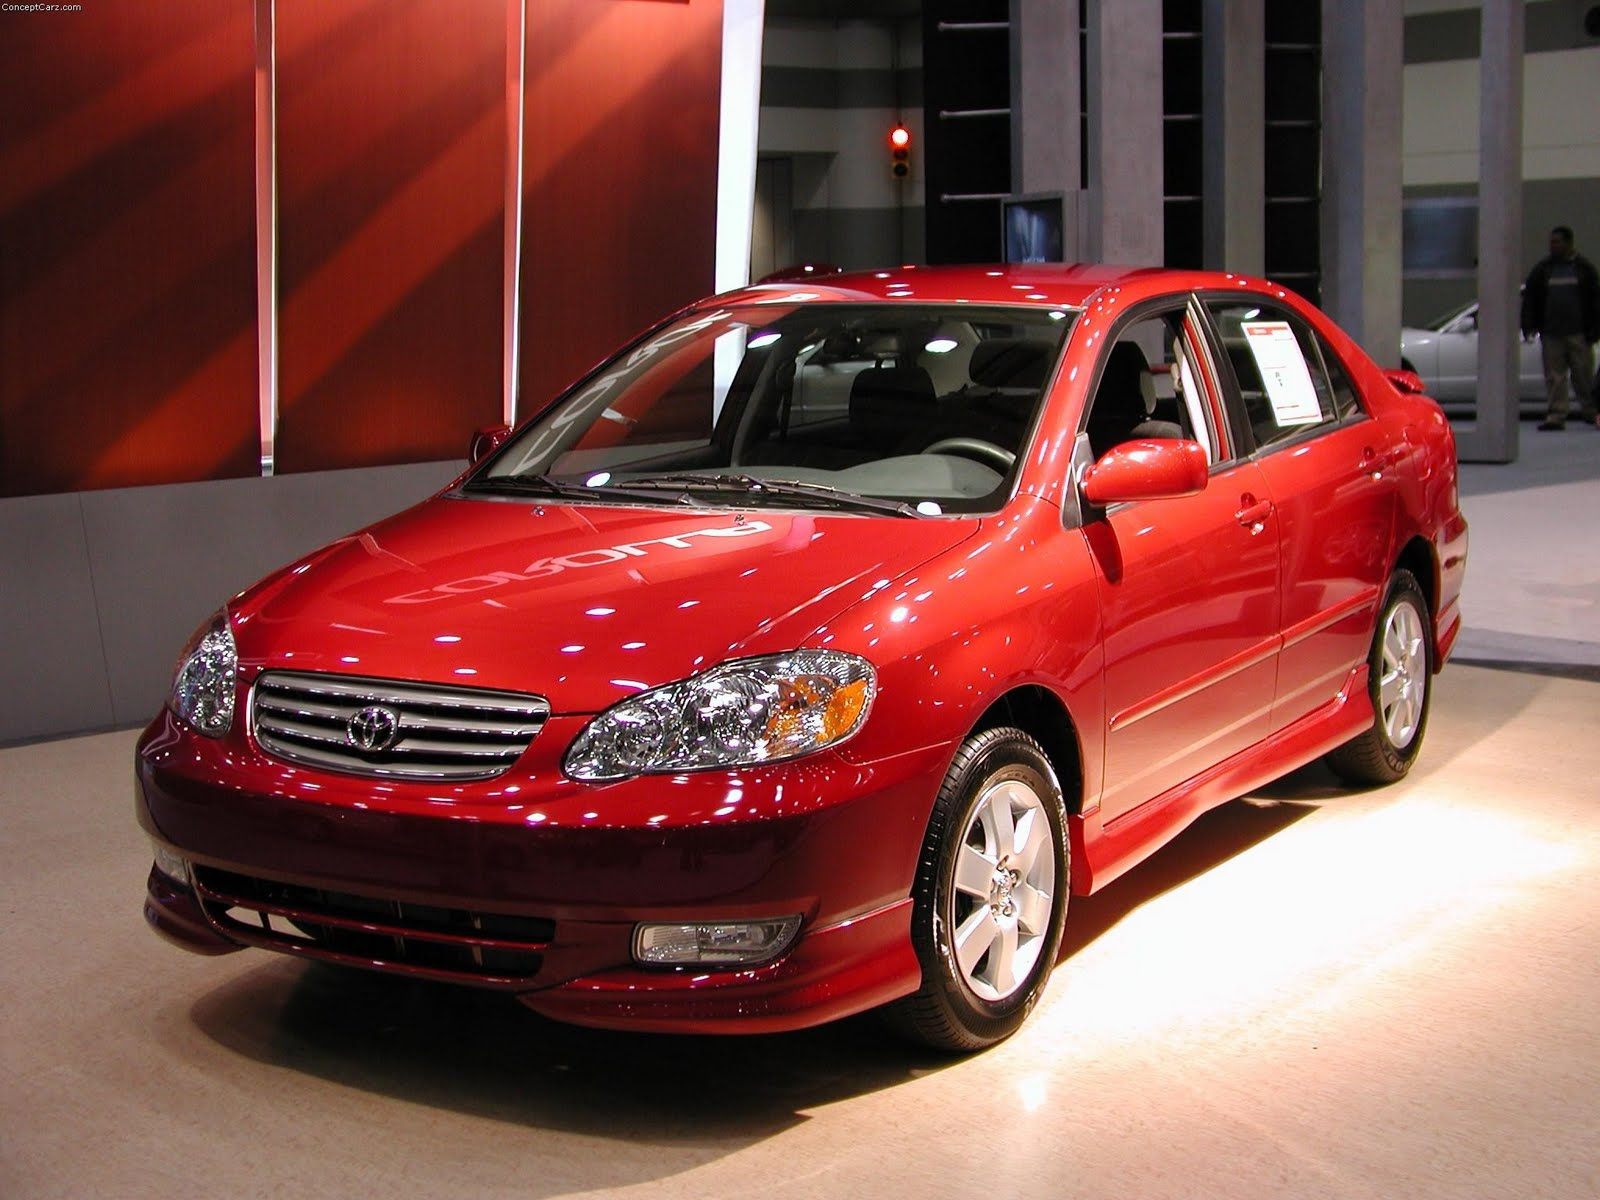 http://3.bp.blogspot.com/-uEZKeis9BFs/Tka5g9R1UpI/AAAAAAAABvs/3LNs-kjjN2k/s1600/Toyota-Corolla-XRS-2011.jpg